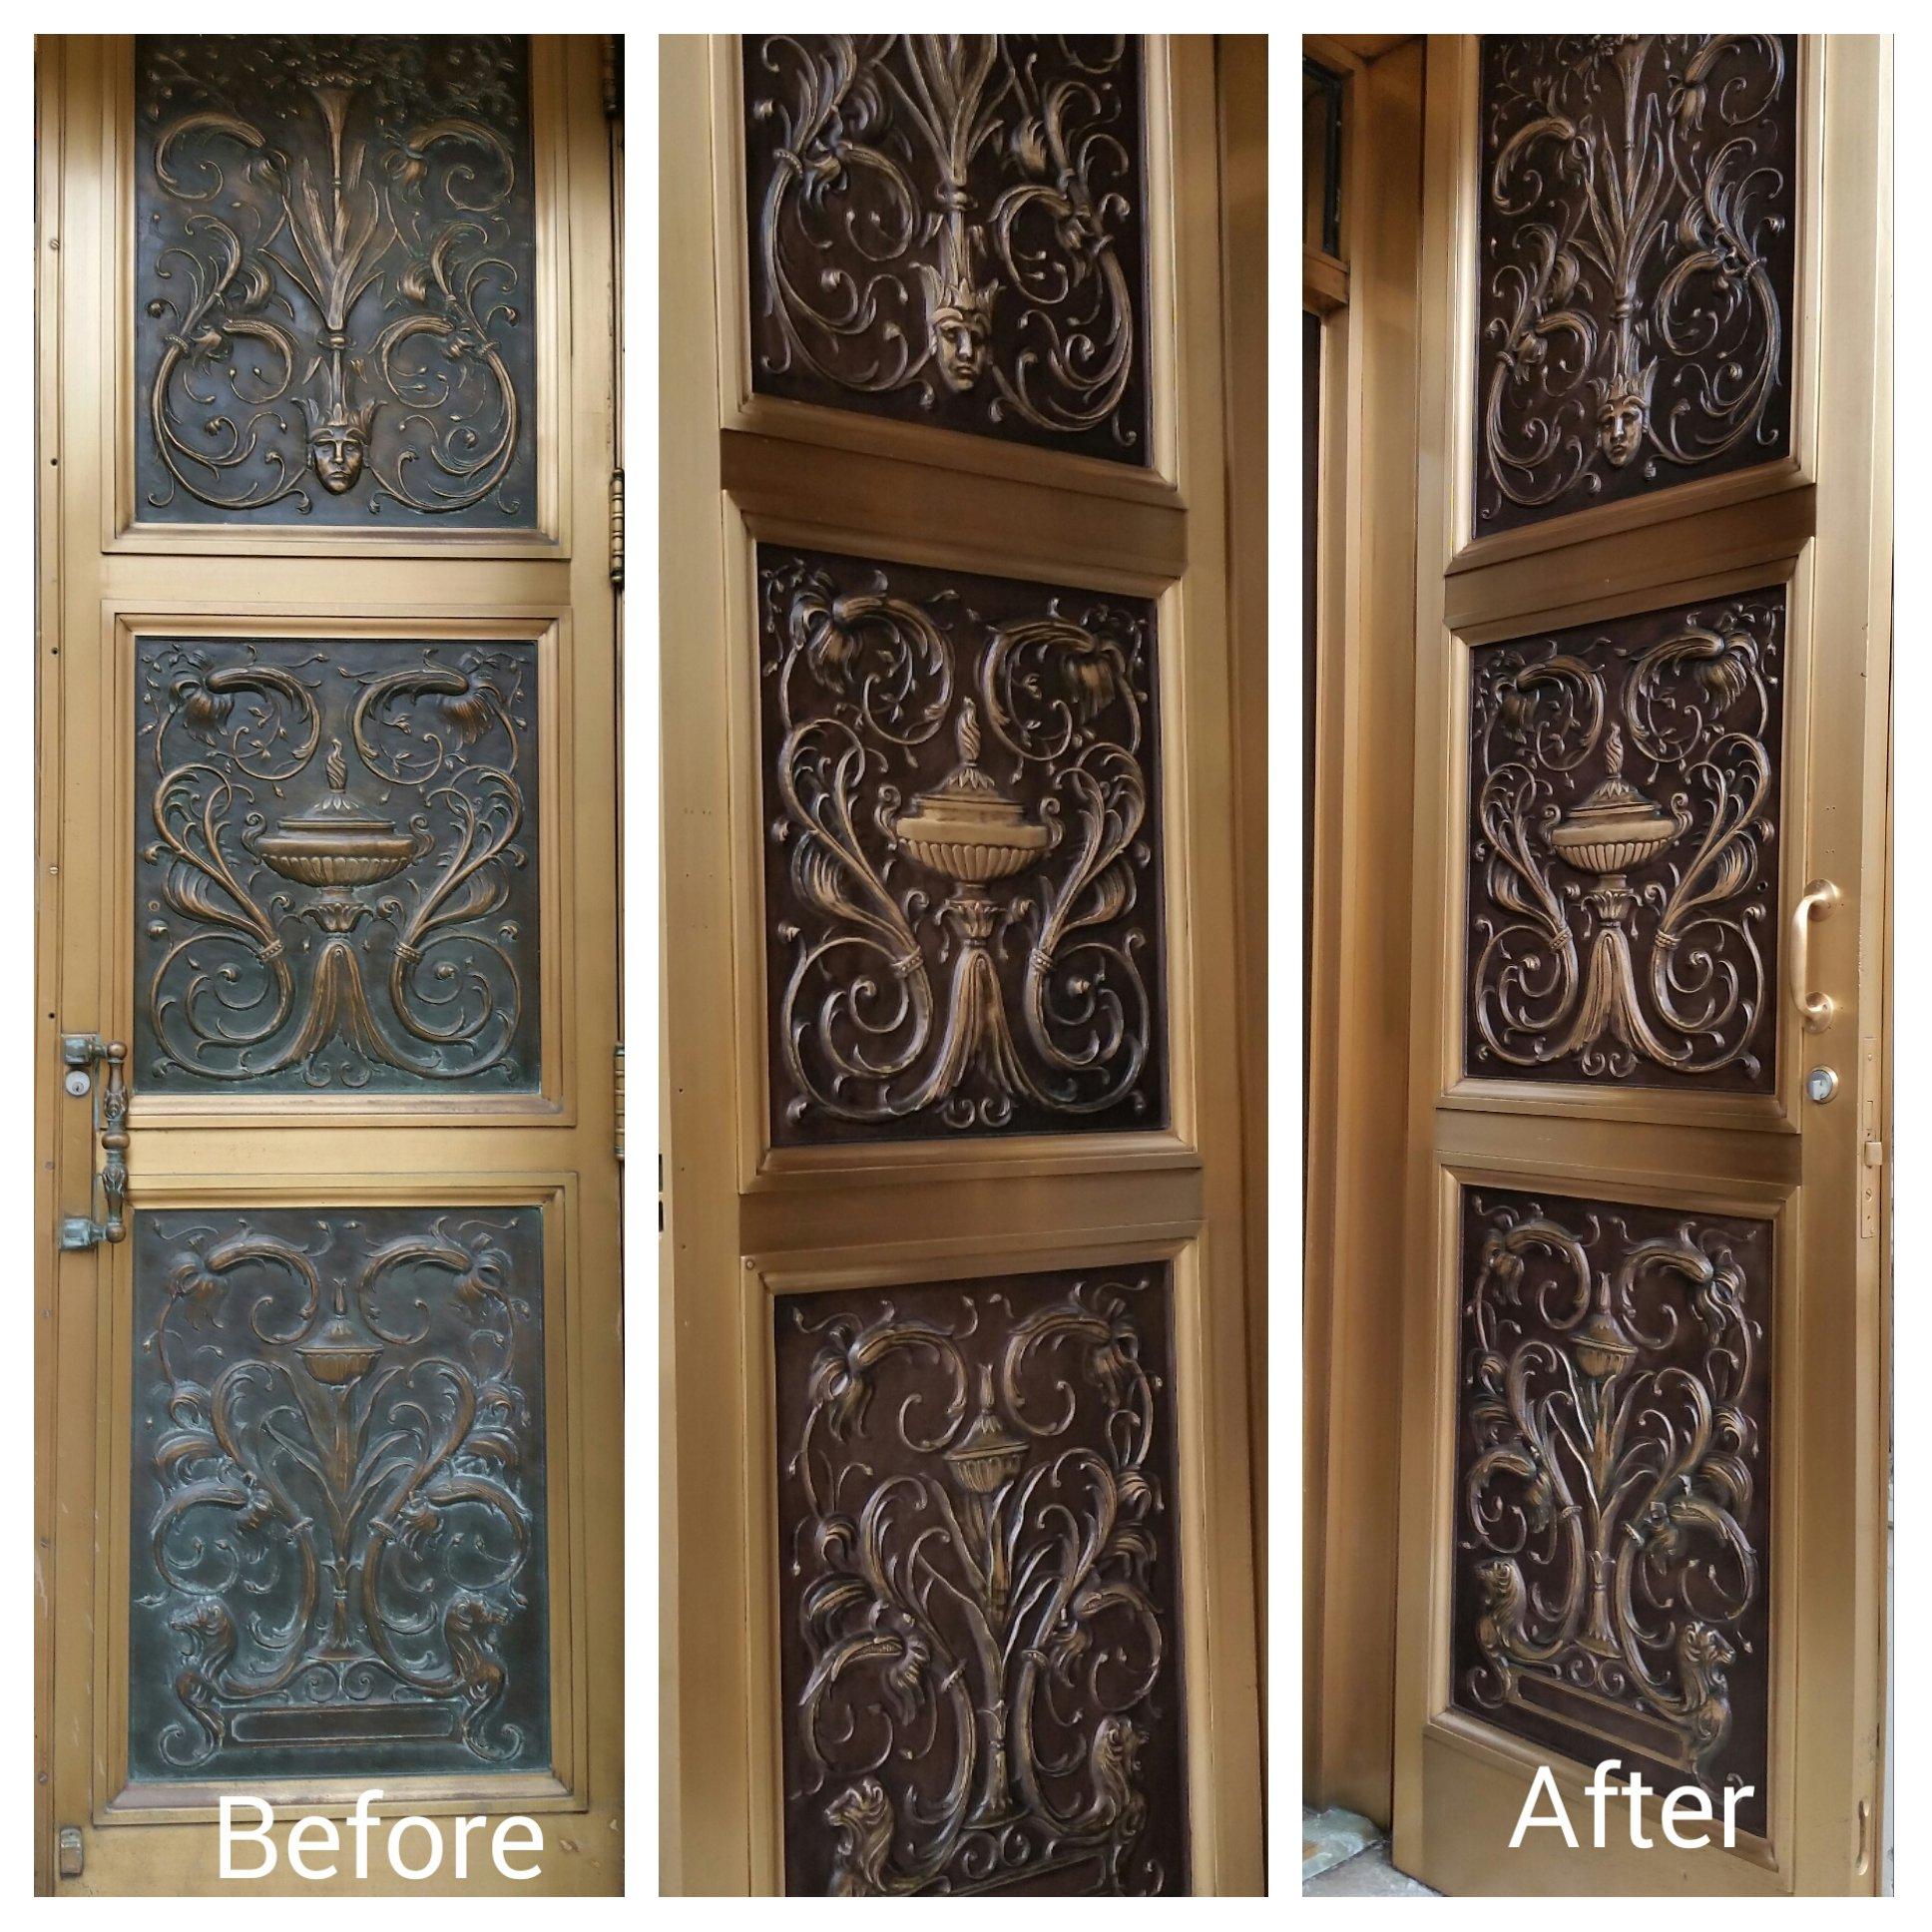 Decorative door panels & Ornate decorative doors in the Deramus Building